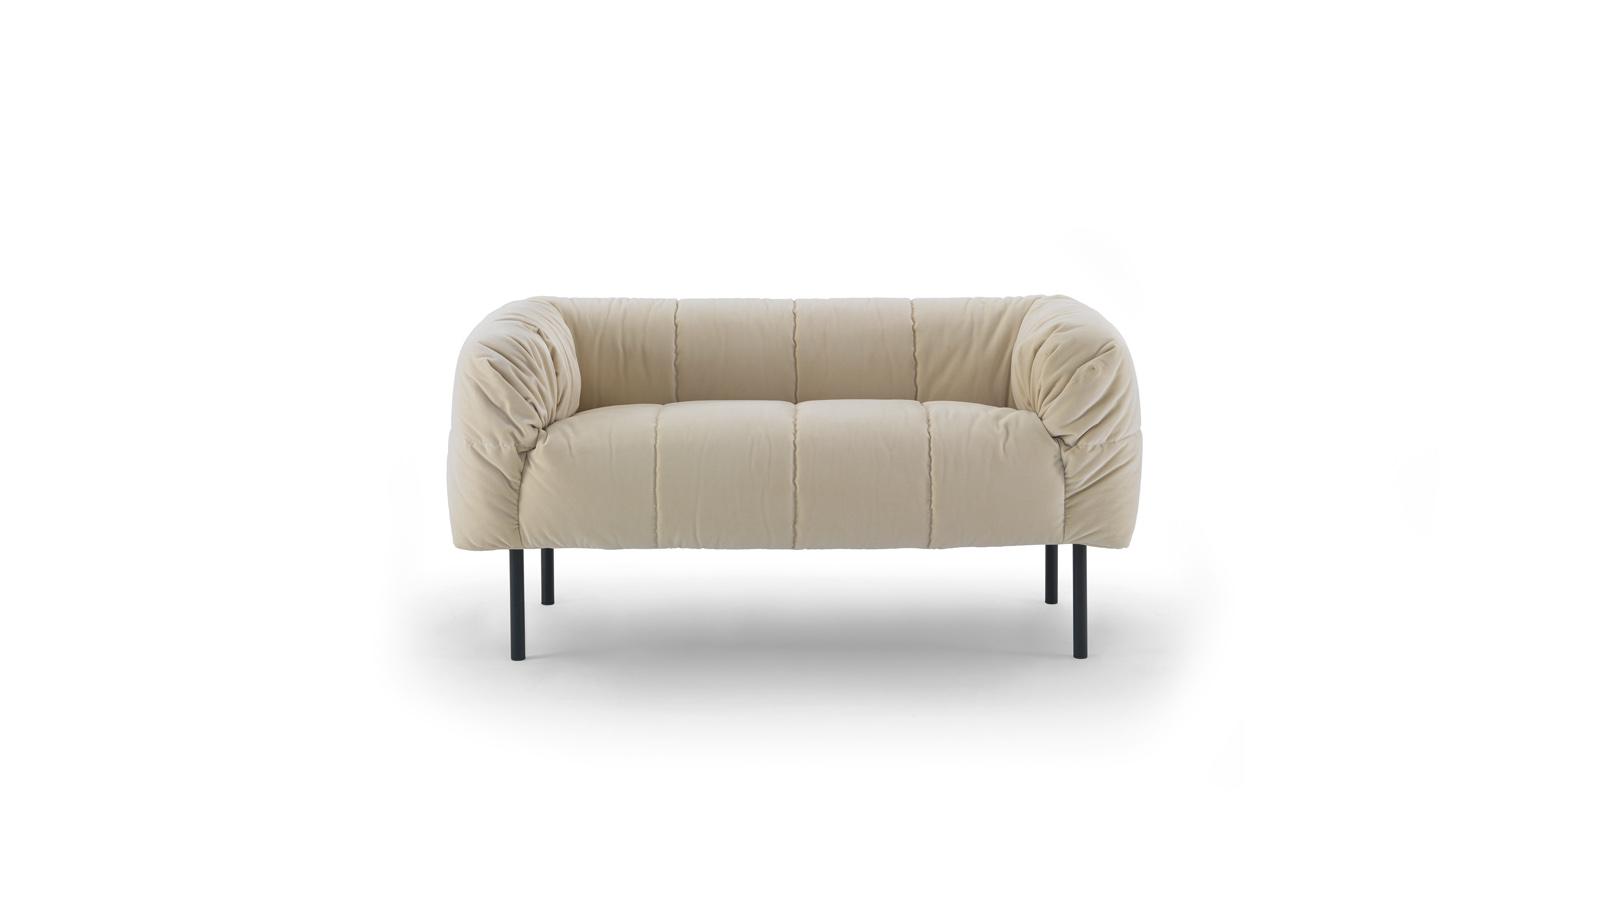 Arflex Pecorelle Poltrona E Sofa Design Cini Boeri Arflex